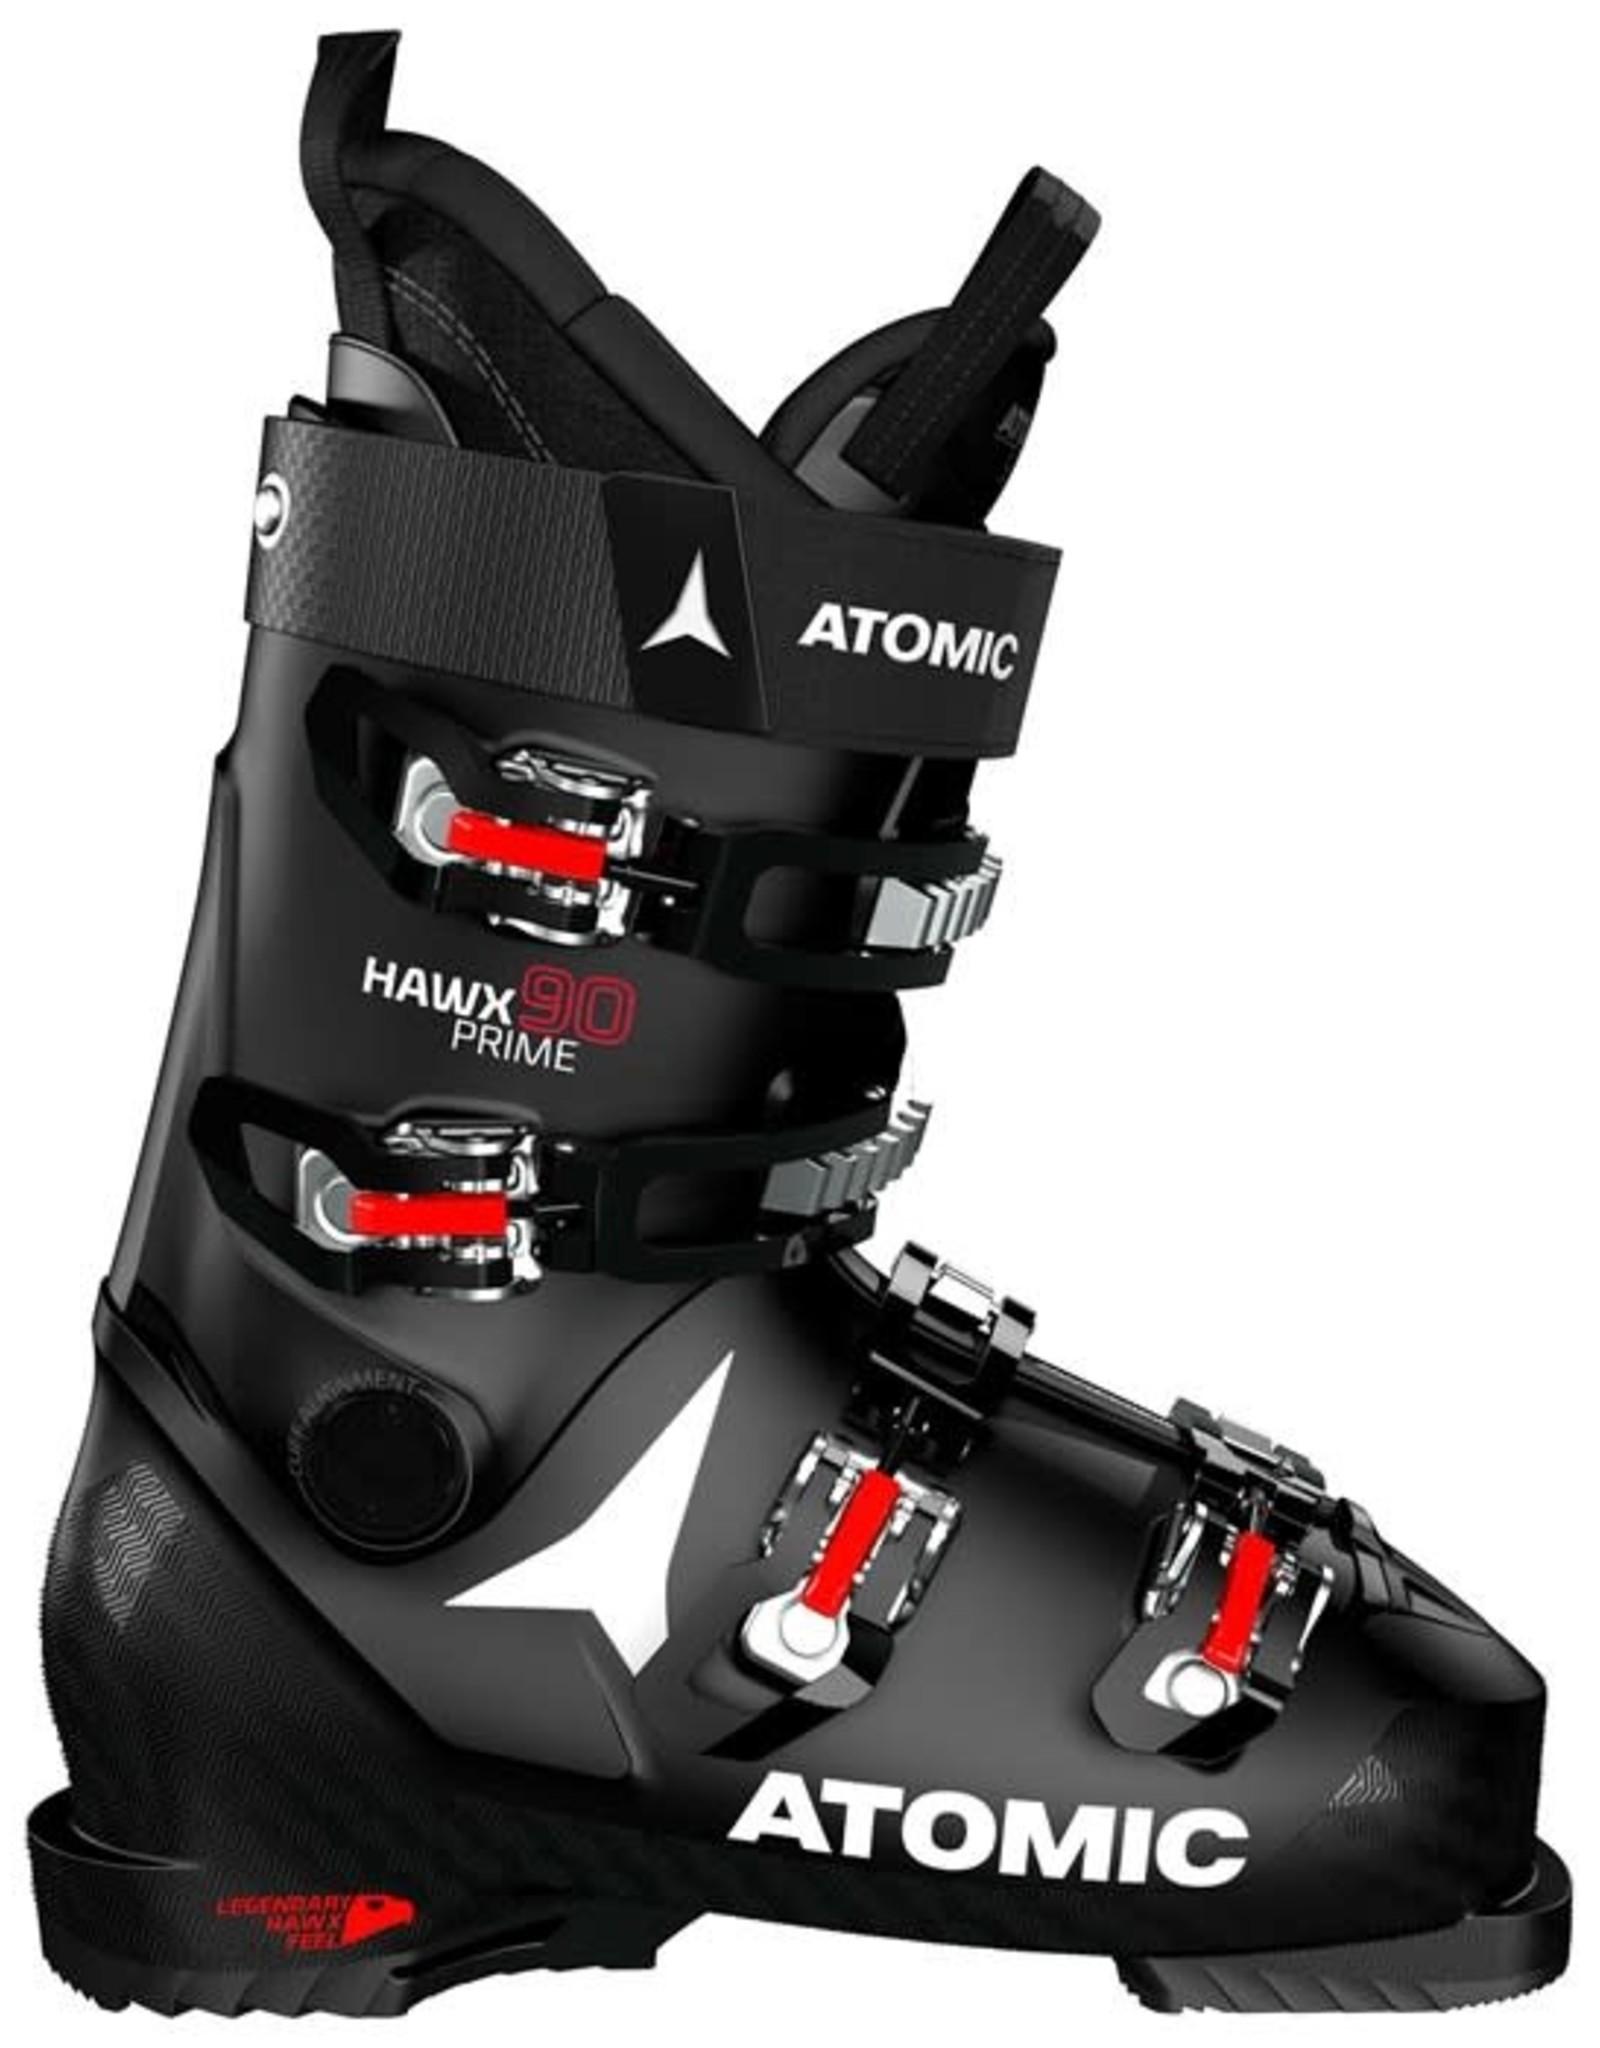 ATOMIC ATOMIC Ski Boots HAWX PRIME 90 (20/21)